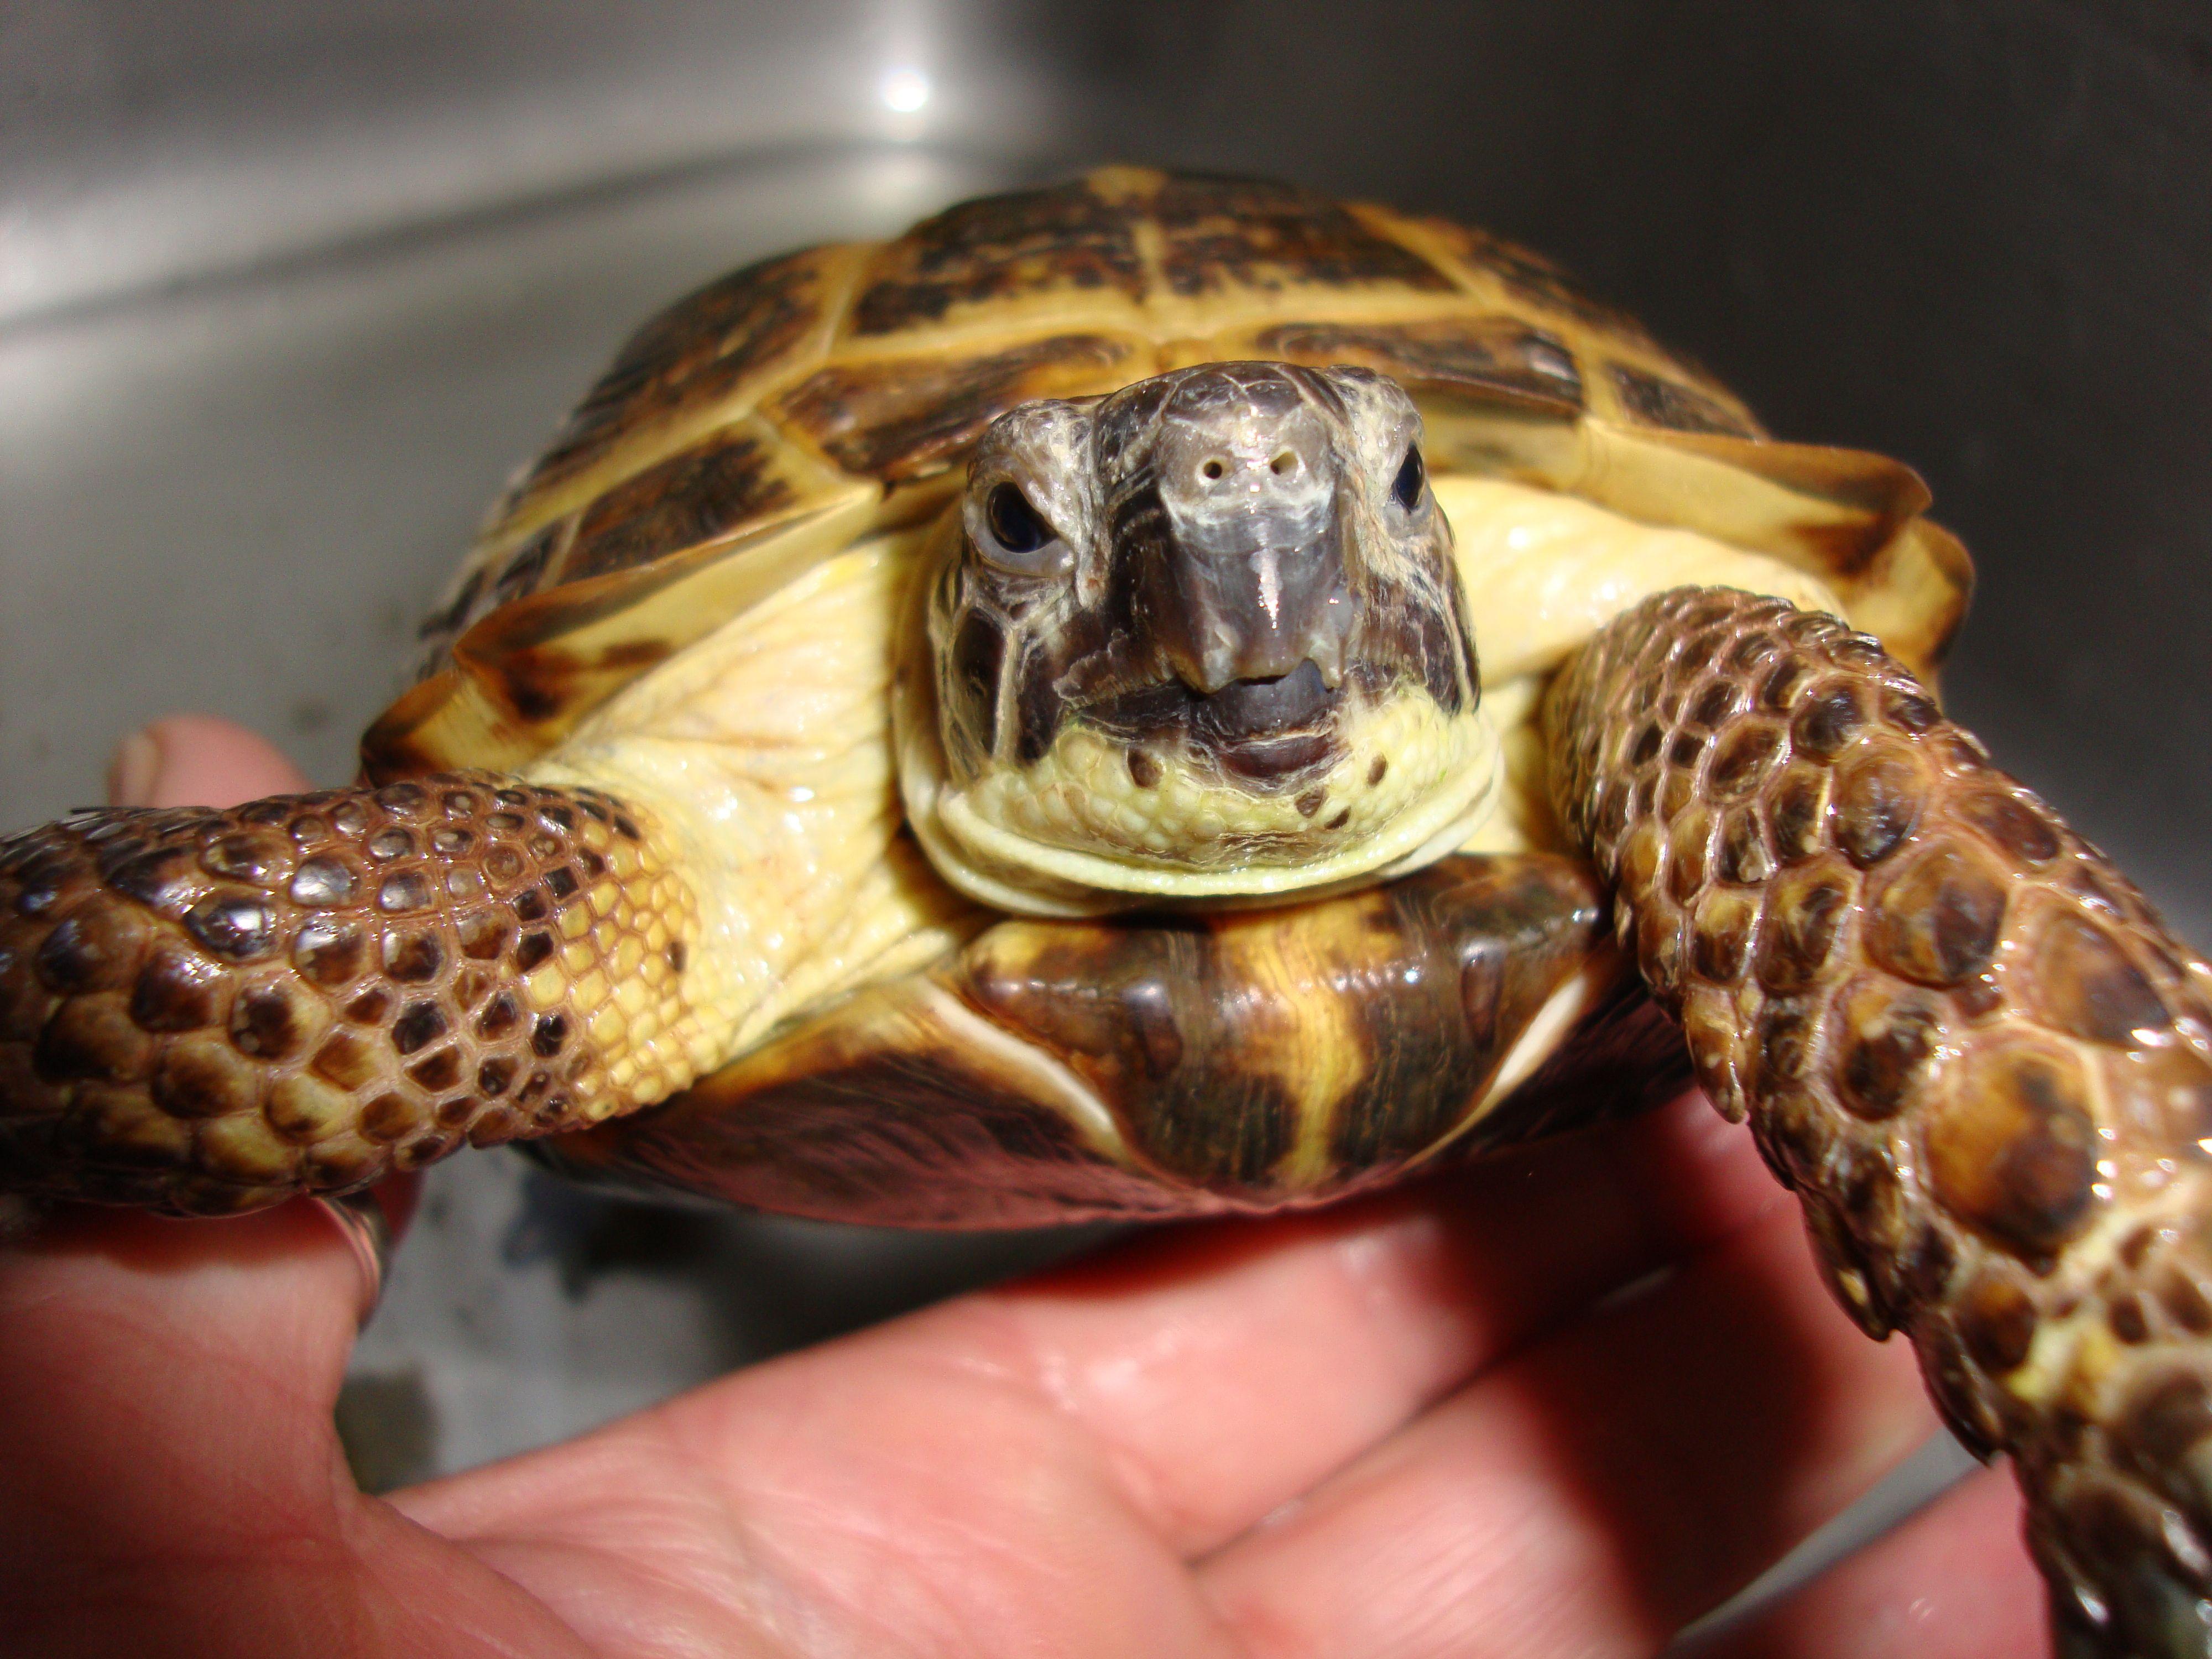 Bath time for Turbo. 1102015 Sulcata tortoise